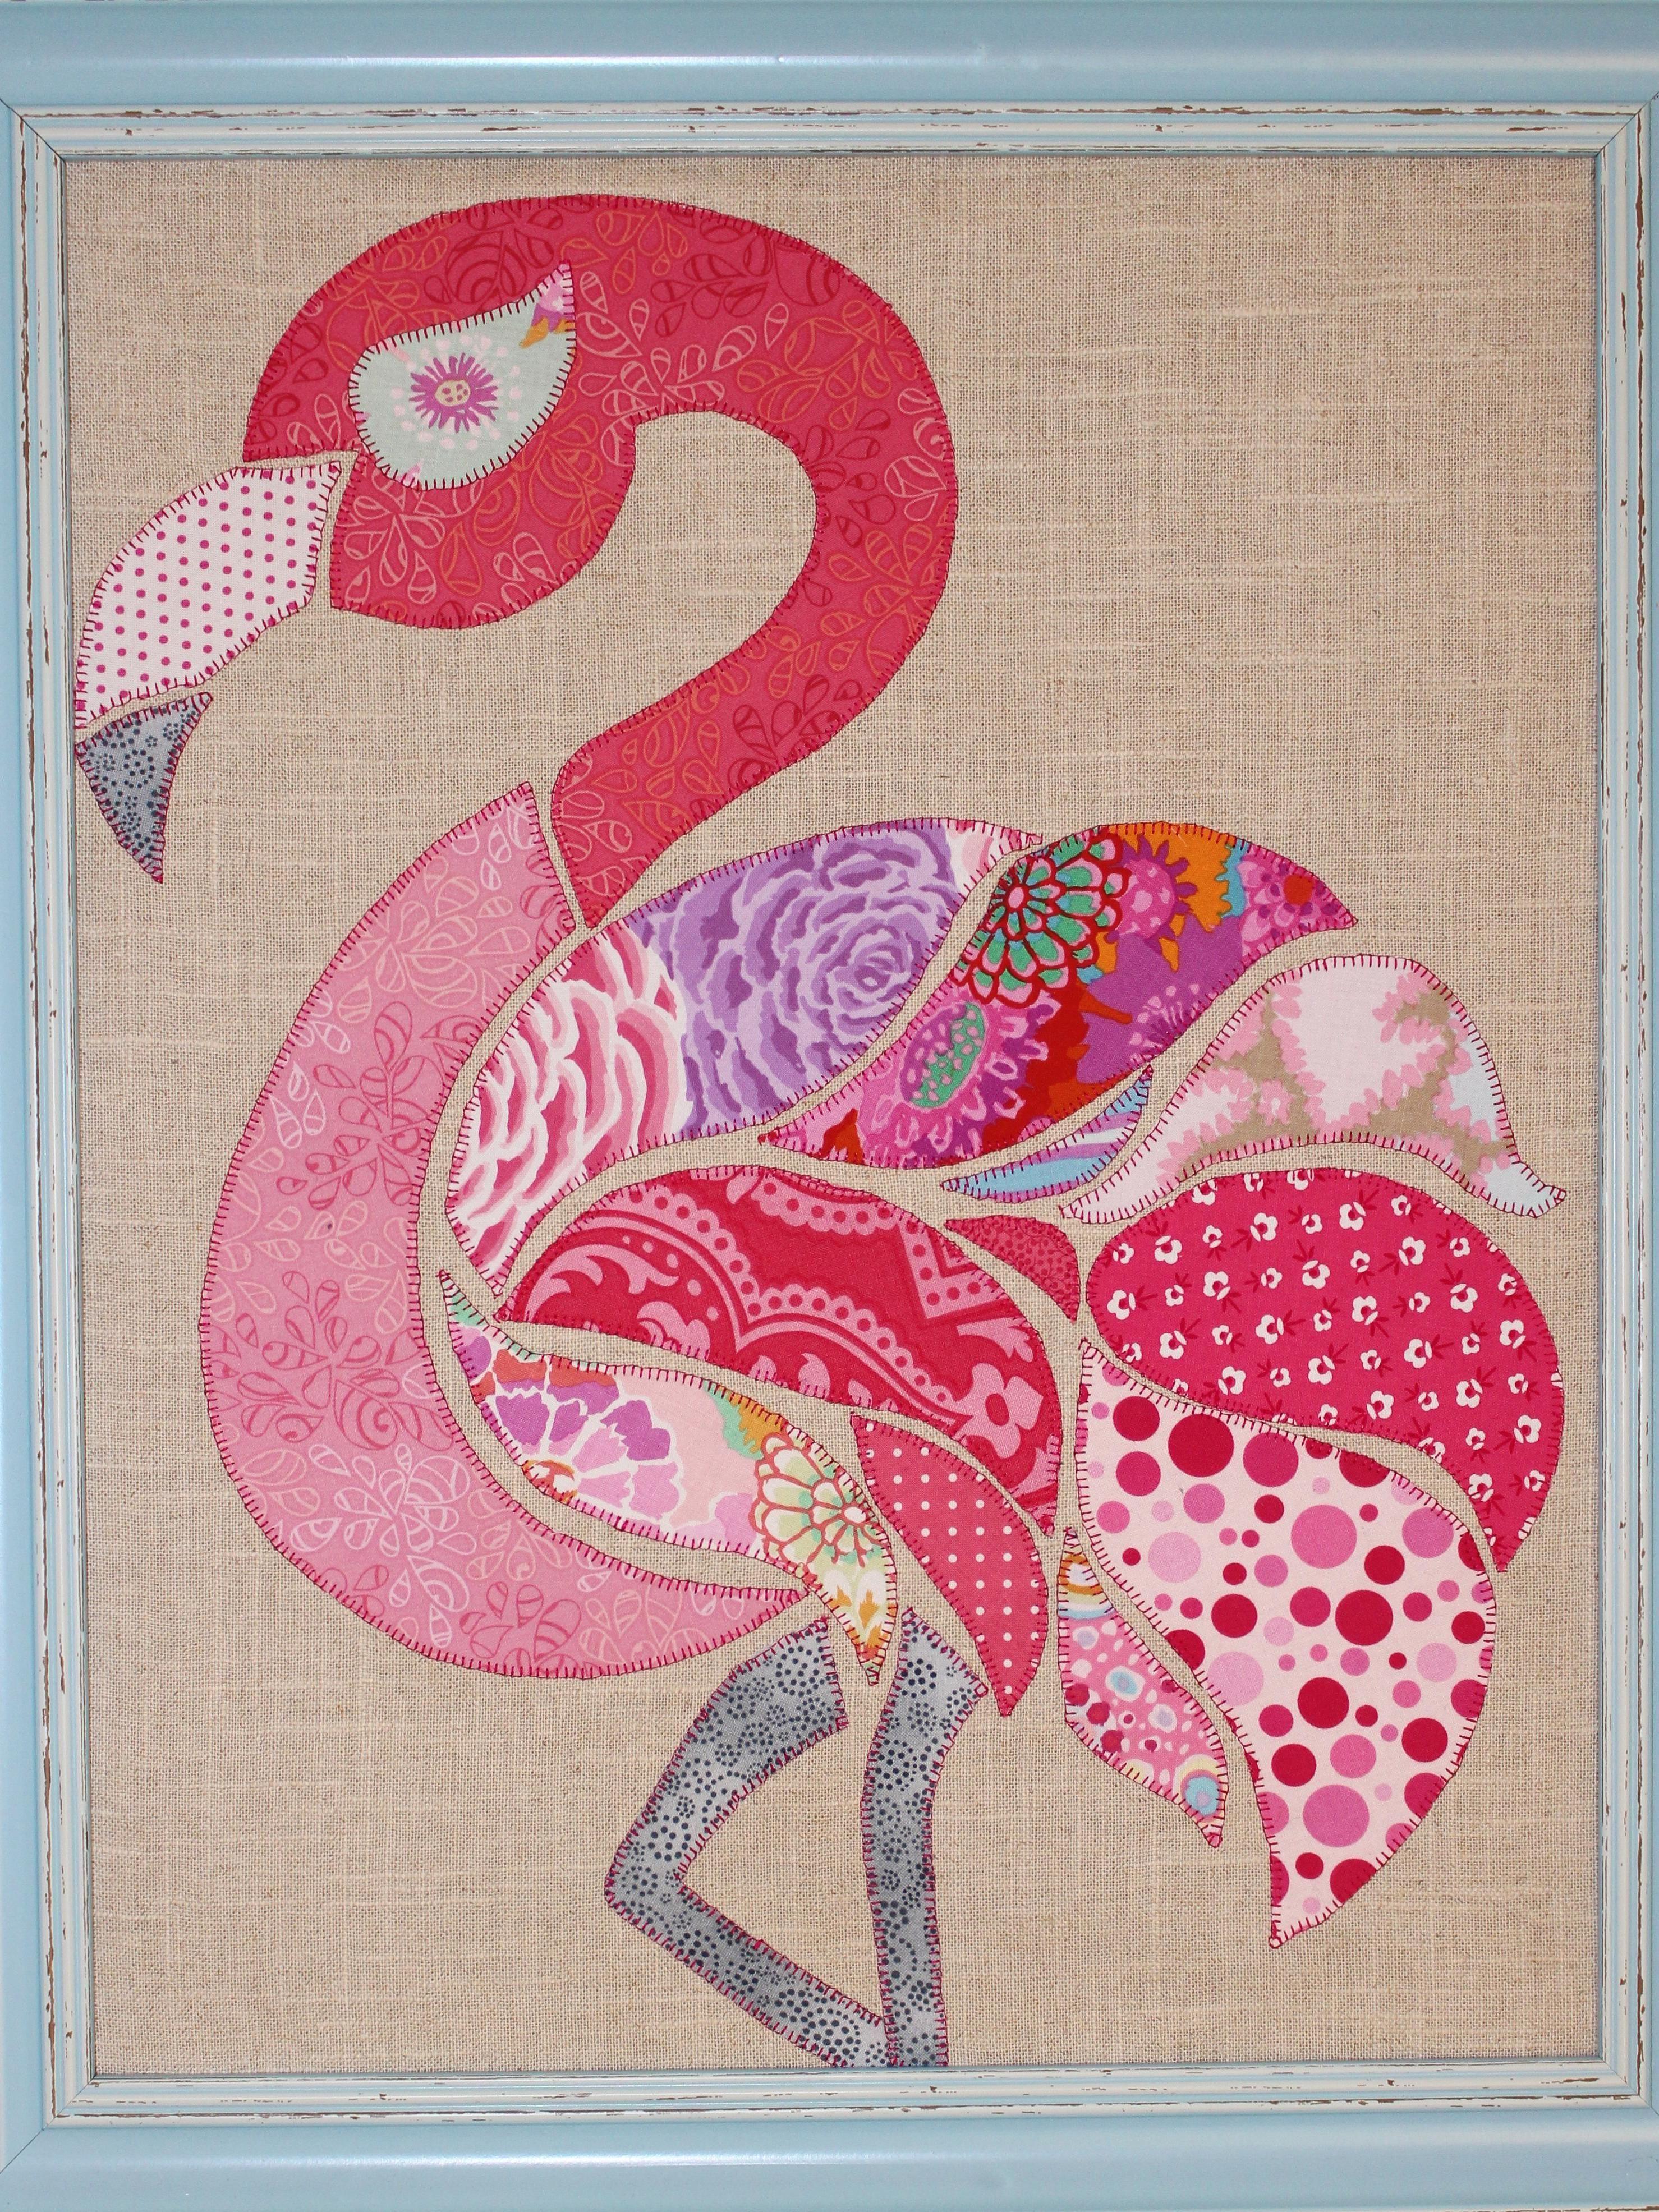 flamingo applique pattern - Google Search   Flamingo   Pinterest ...